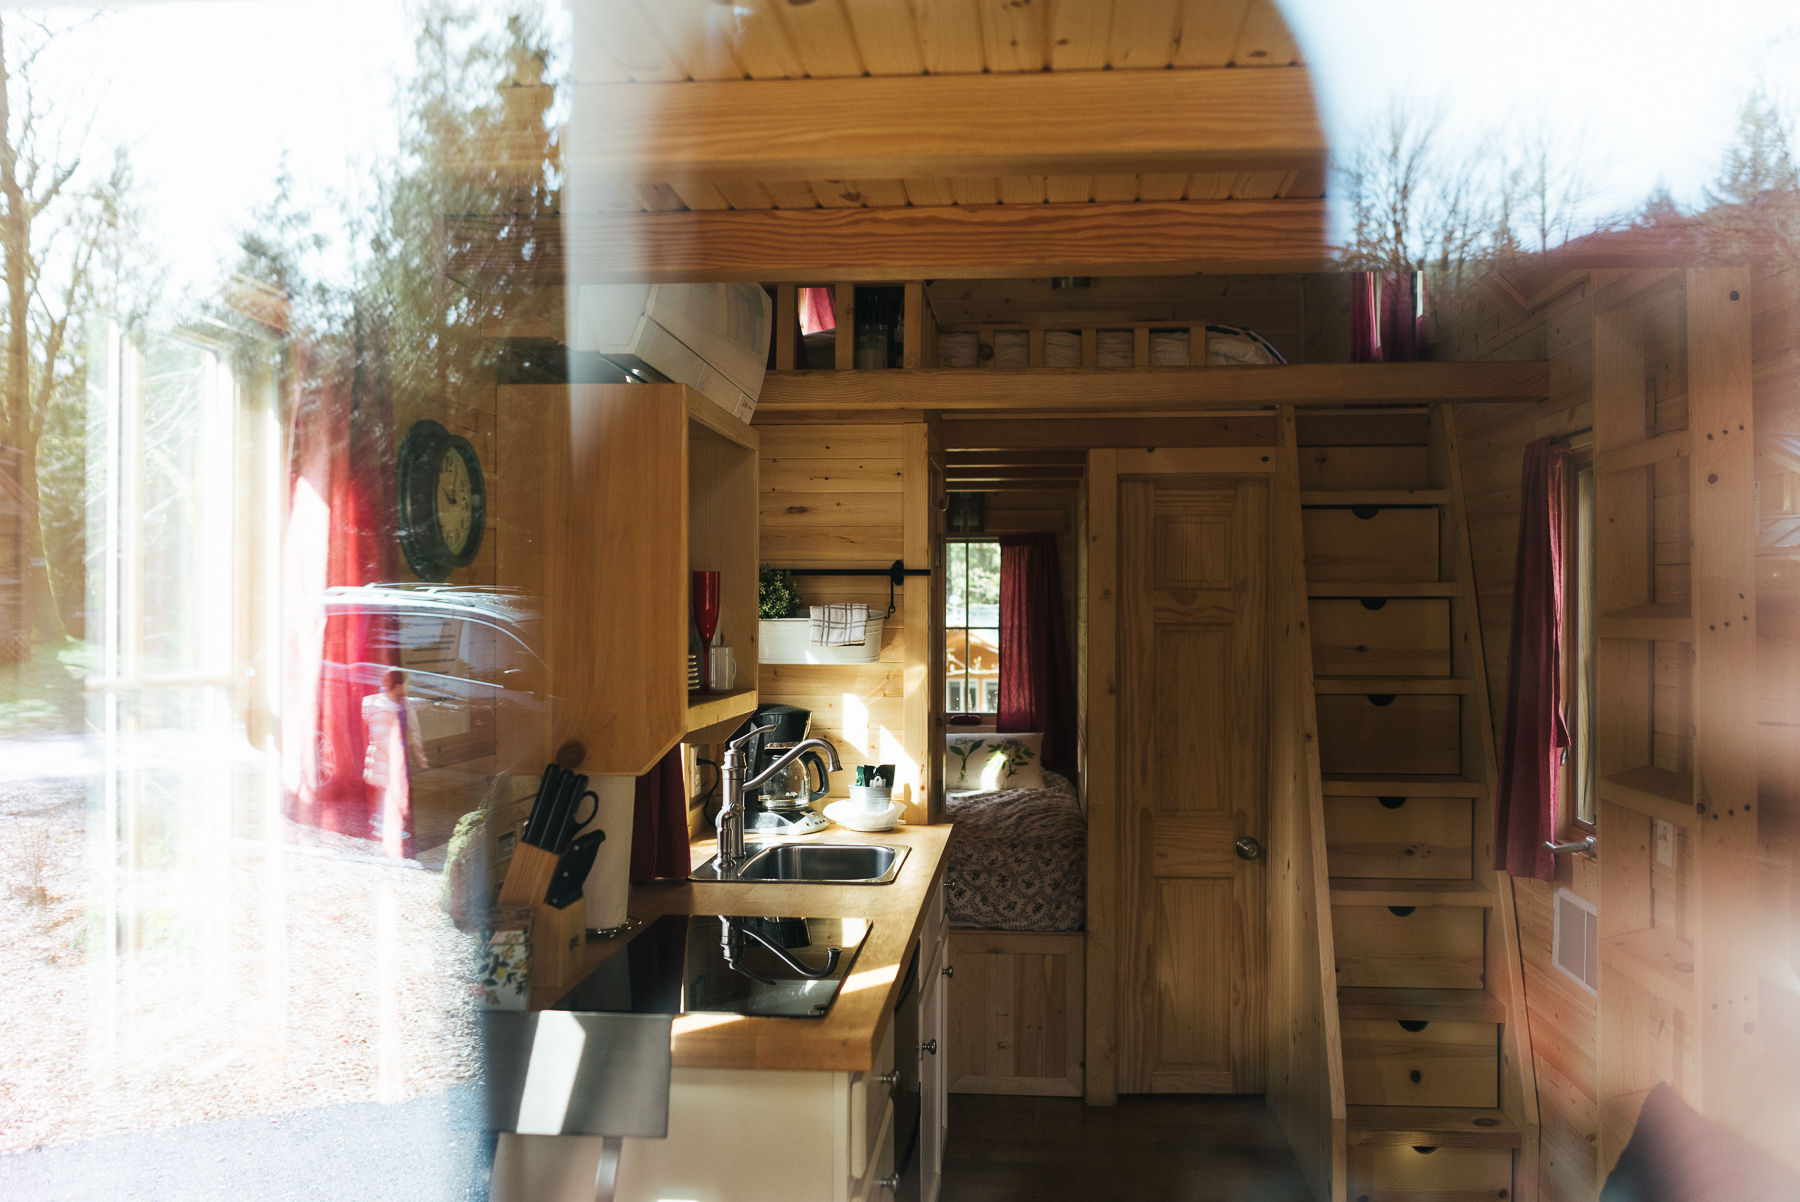 inside of tiny house through window